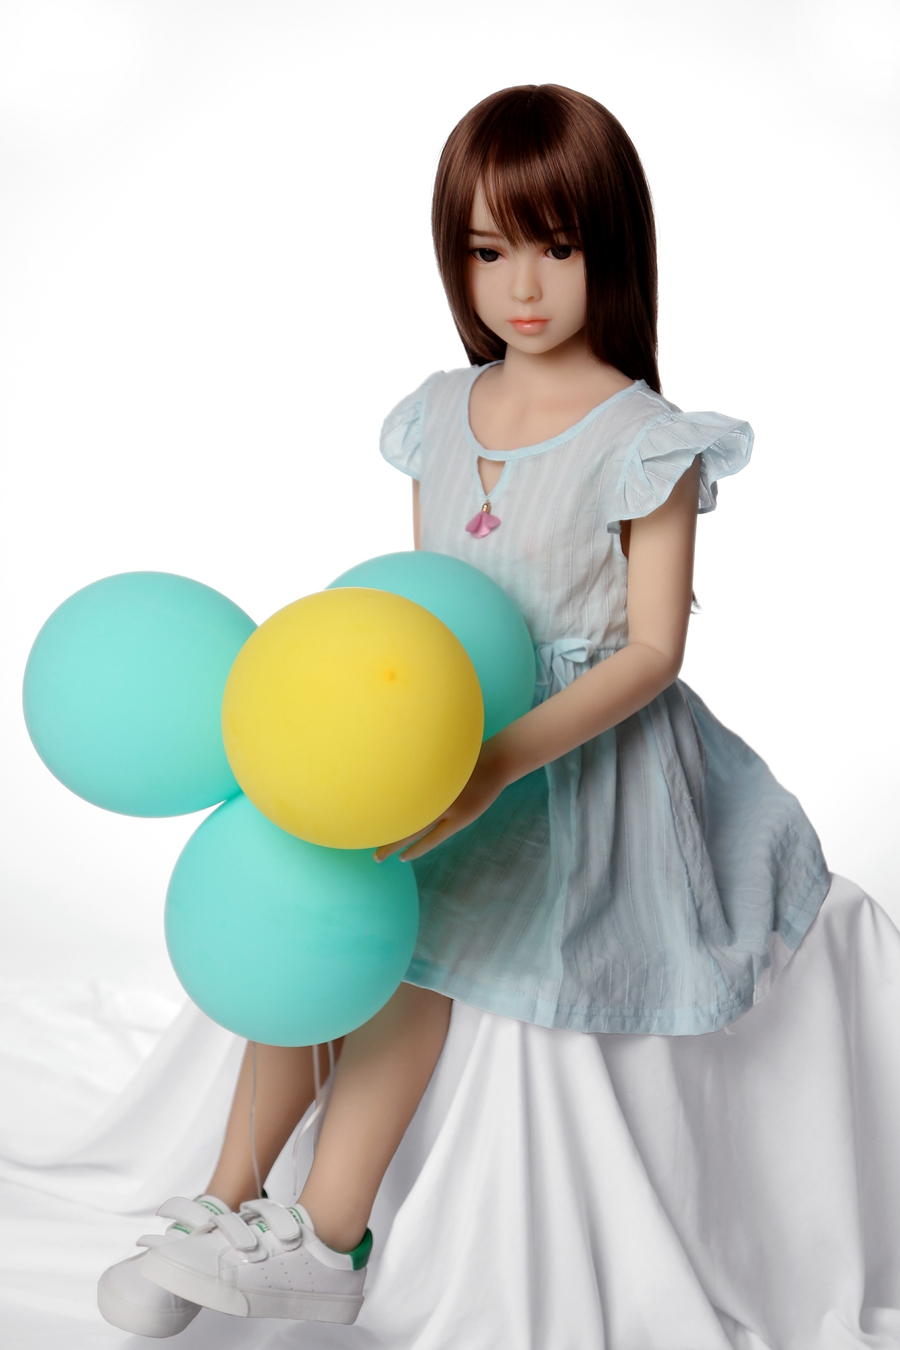 SEXDO New 100CM Flat Chest Sex Doll Little Girl Love Doll Cute